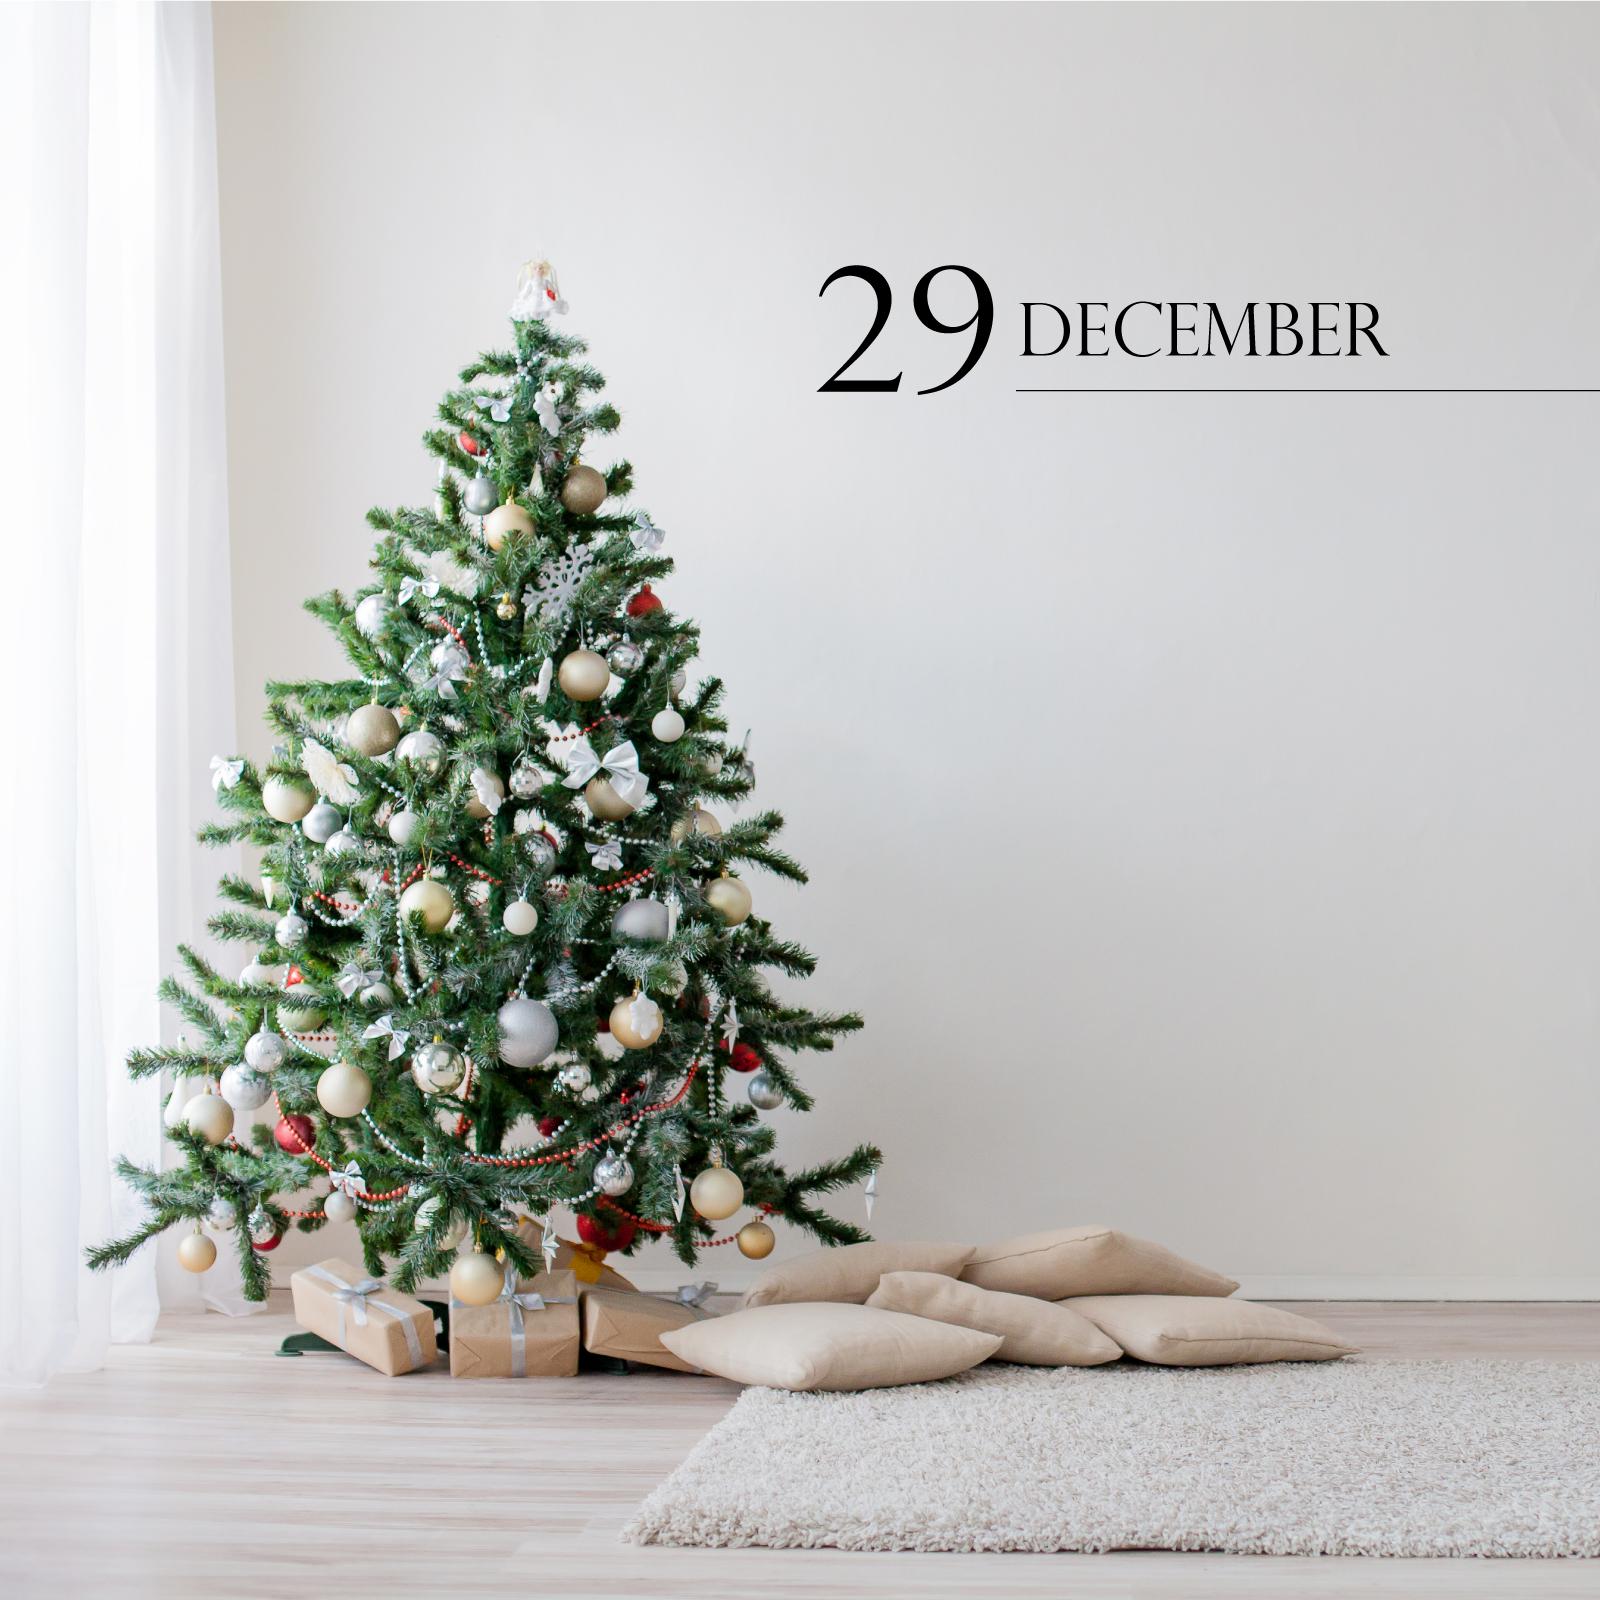 29 december